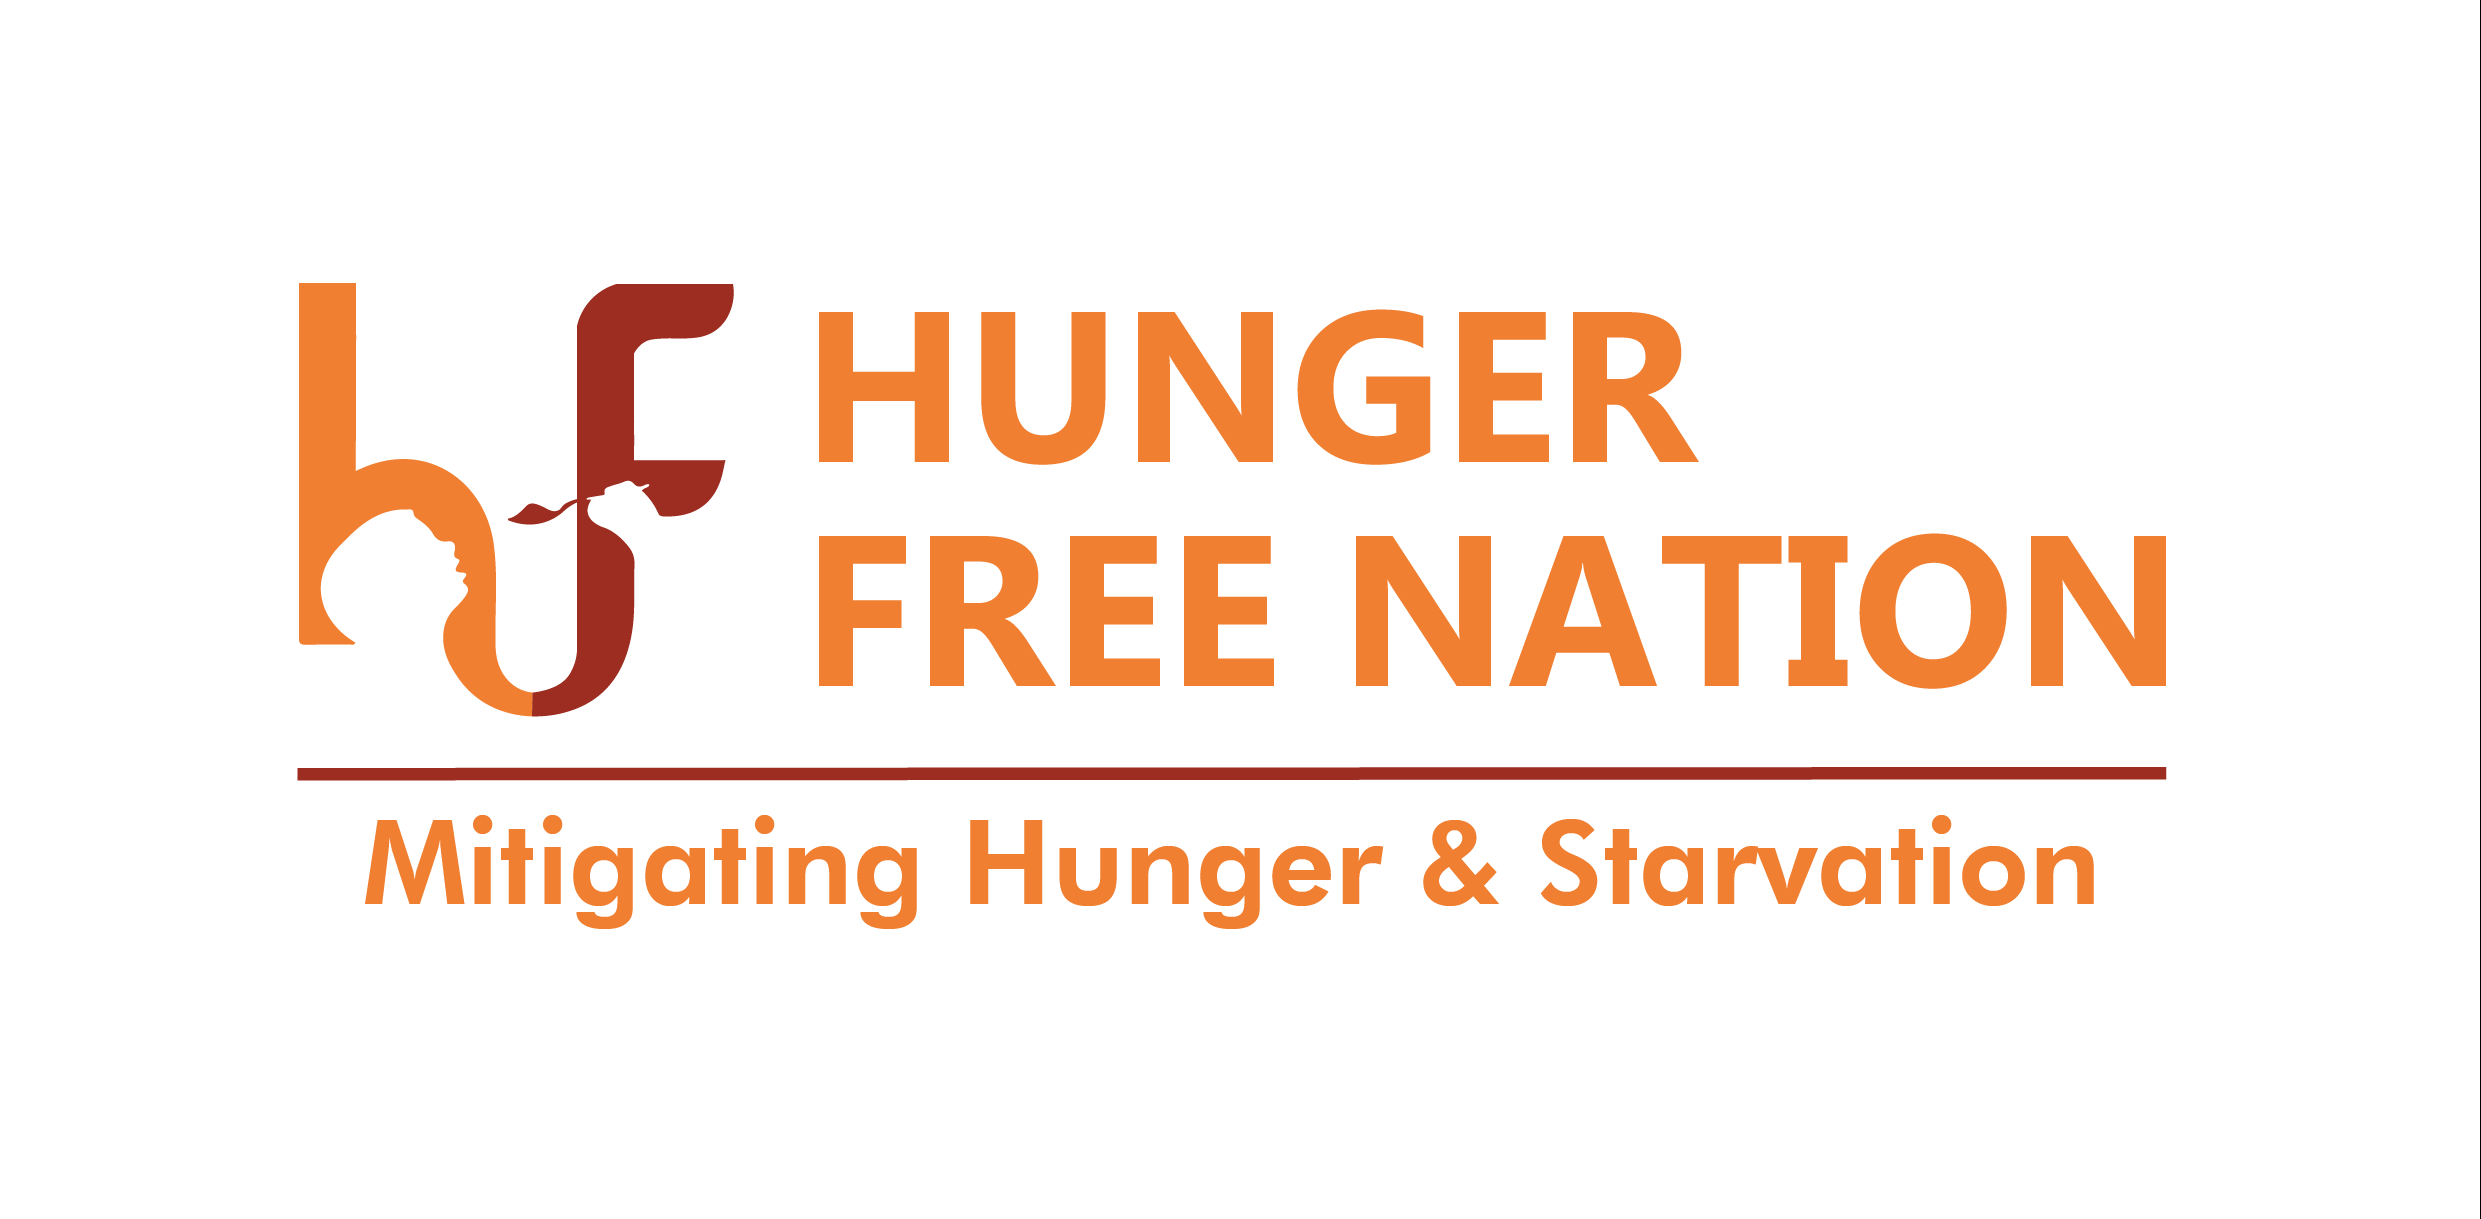 Hunger Free Nation